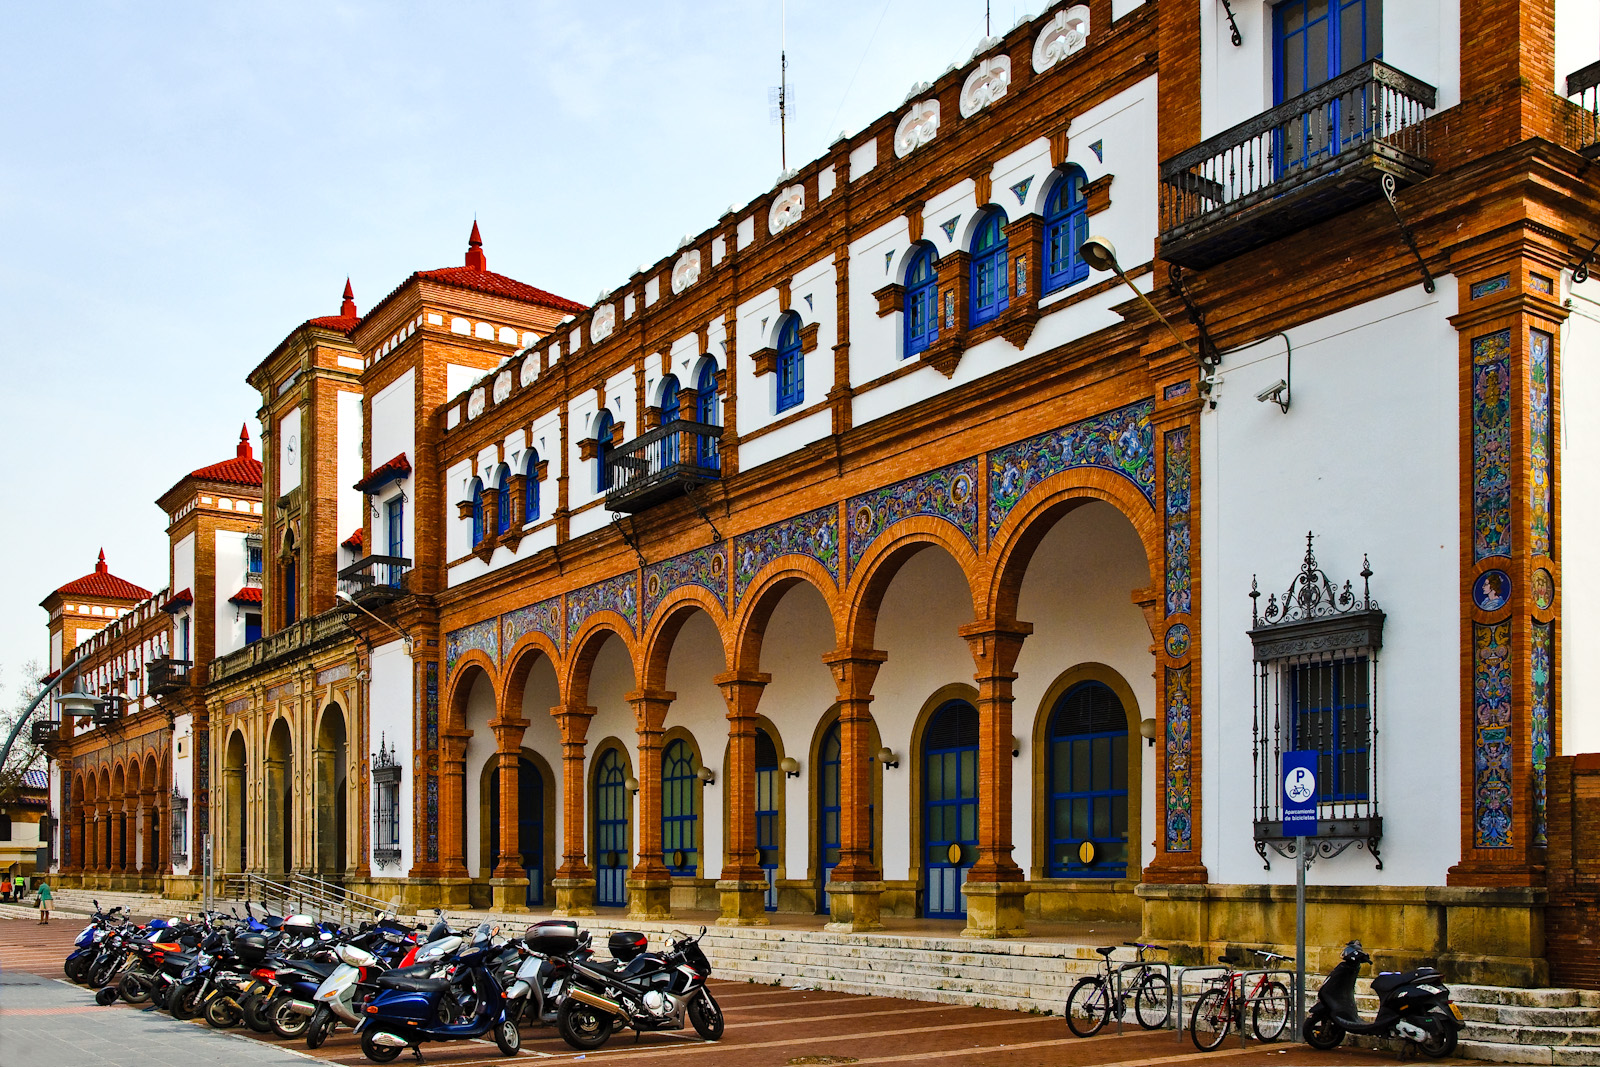 Bahnhof in jerez de la frontera foto bild europe for Azulejos jerez de la frontera